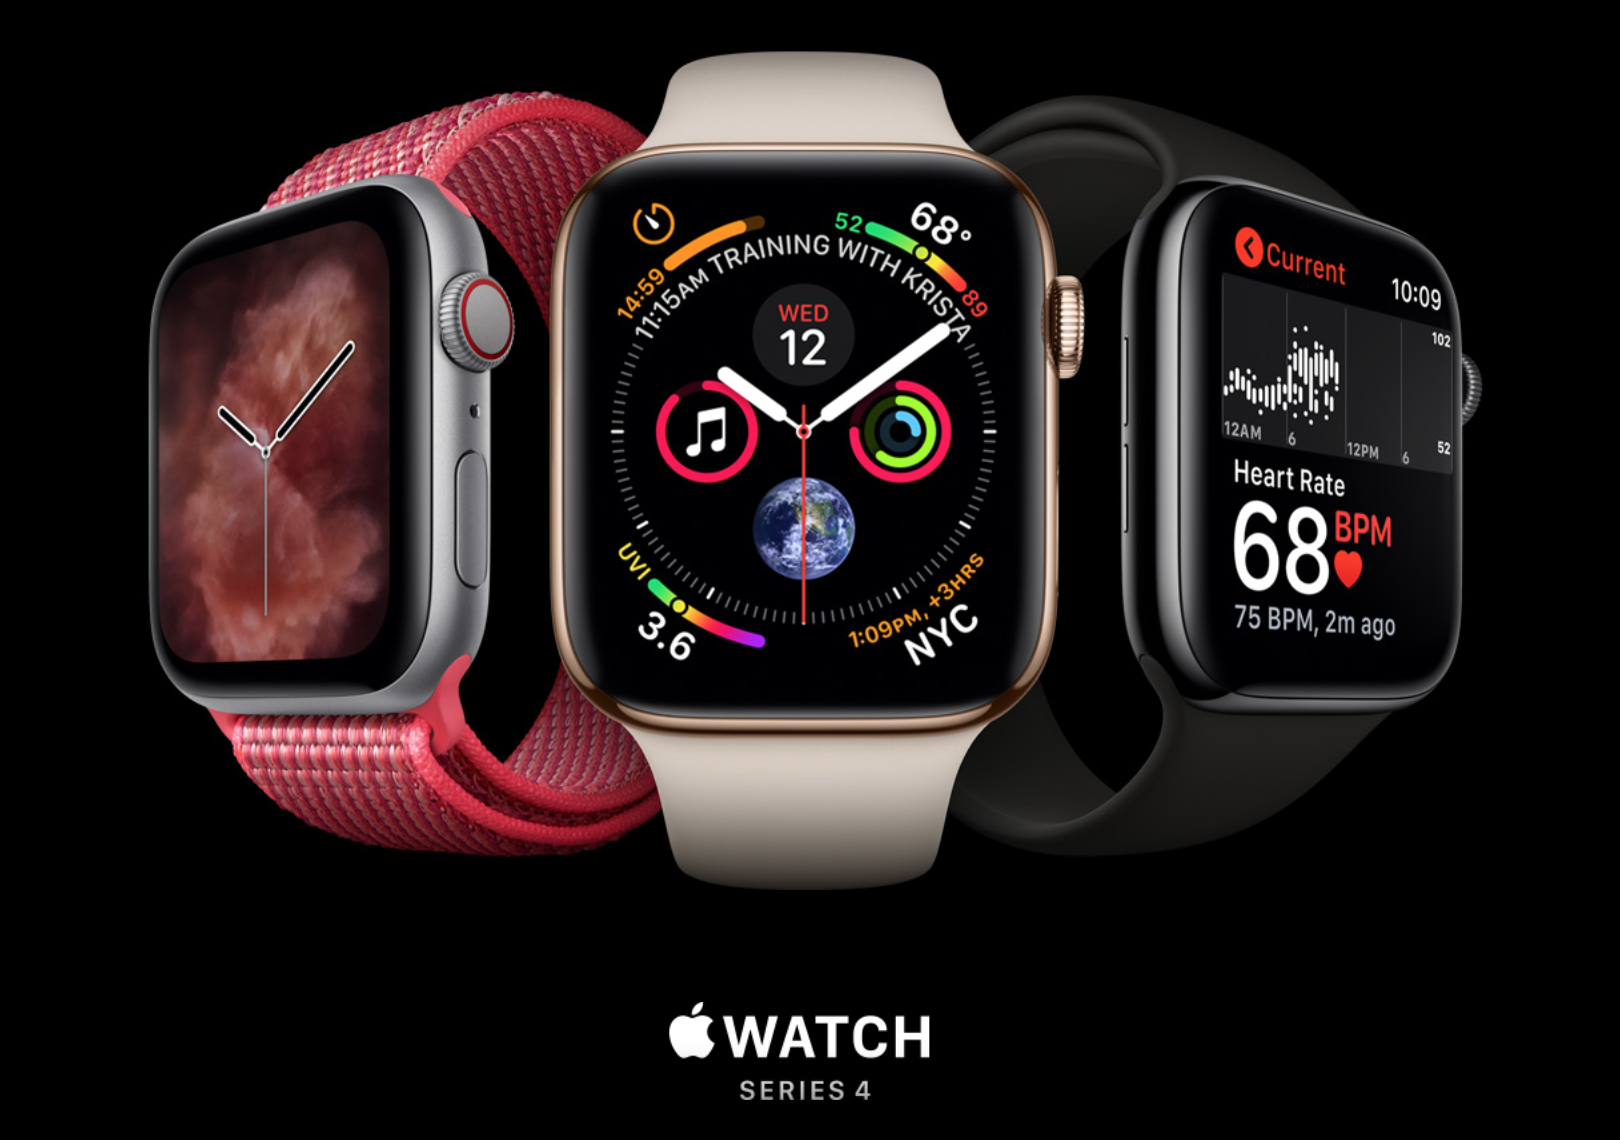 a3093730c تعرف على مميزات ومواصفات ساعة أبل الجديدة Apple Watch Series 4 ...